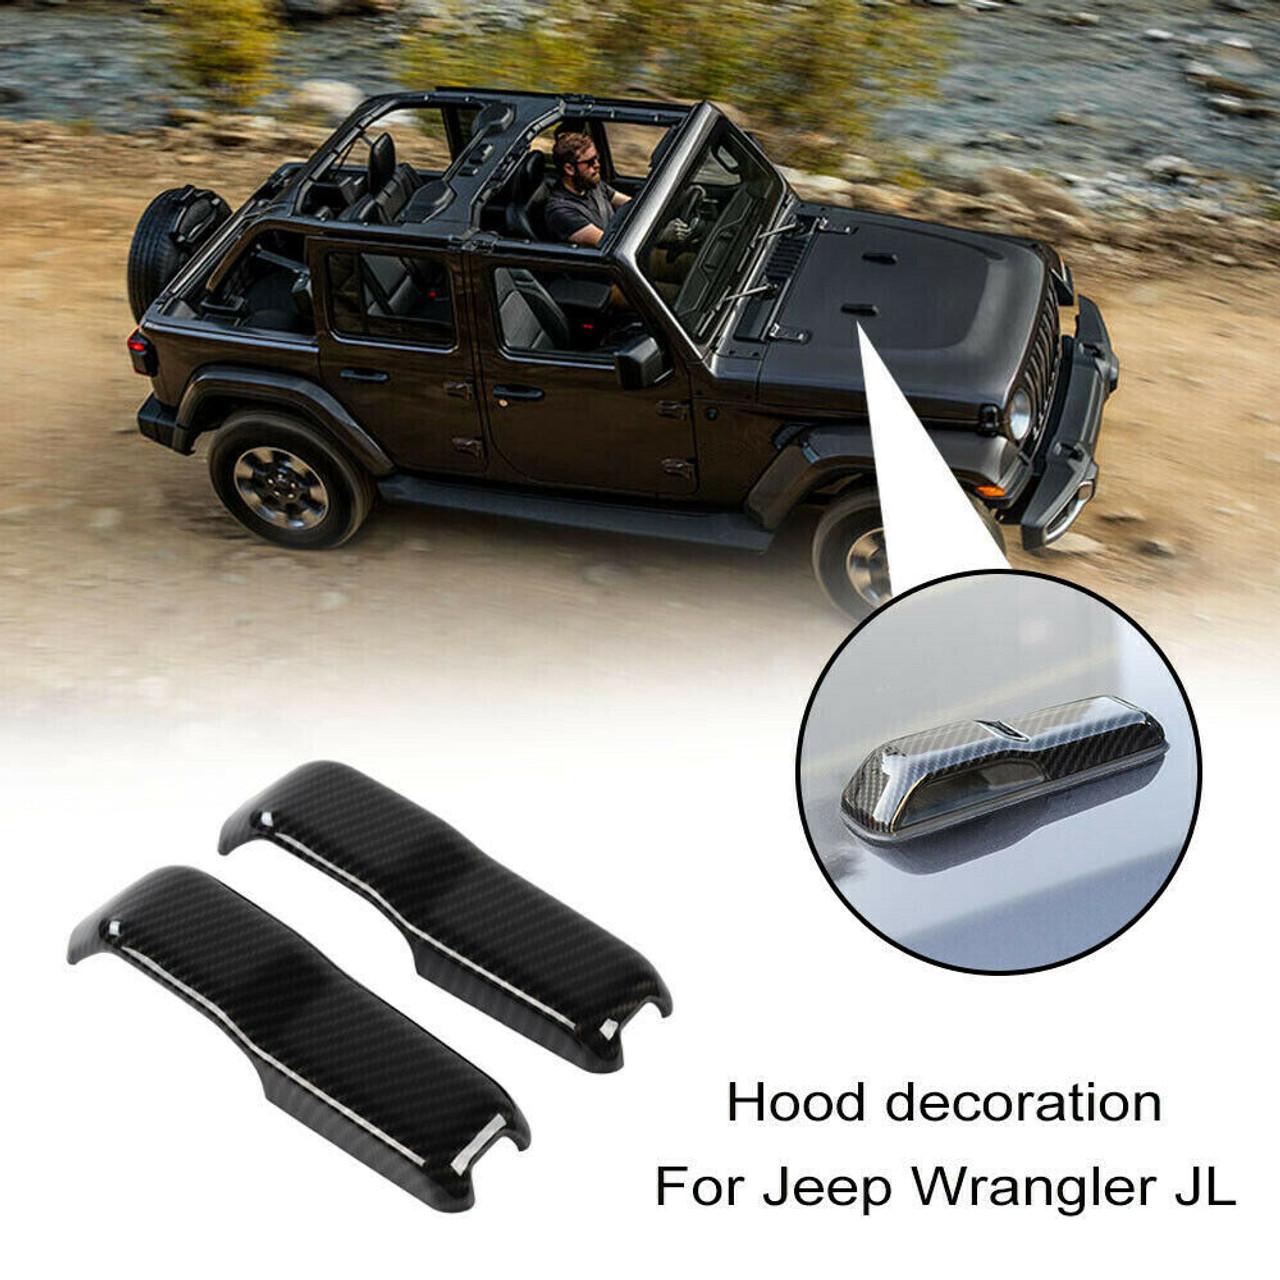 Carbon Fiber ABS Front Engine Hood Air Vent Cover Trim For Wrangler JL 2018-2019